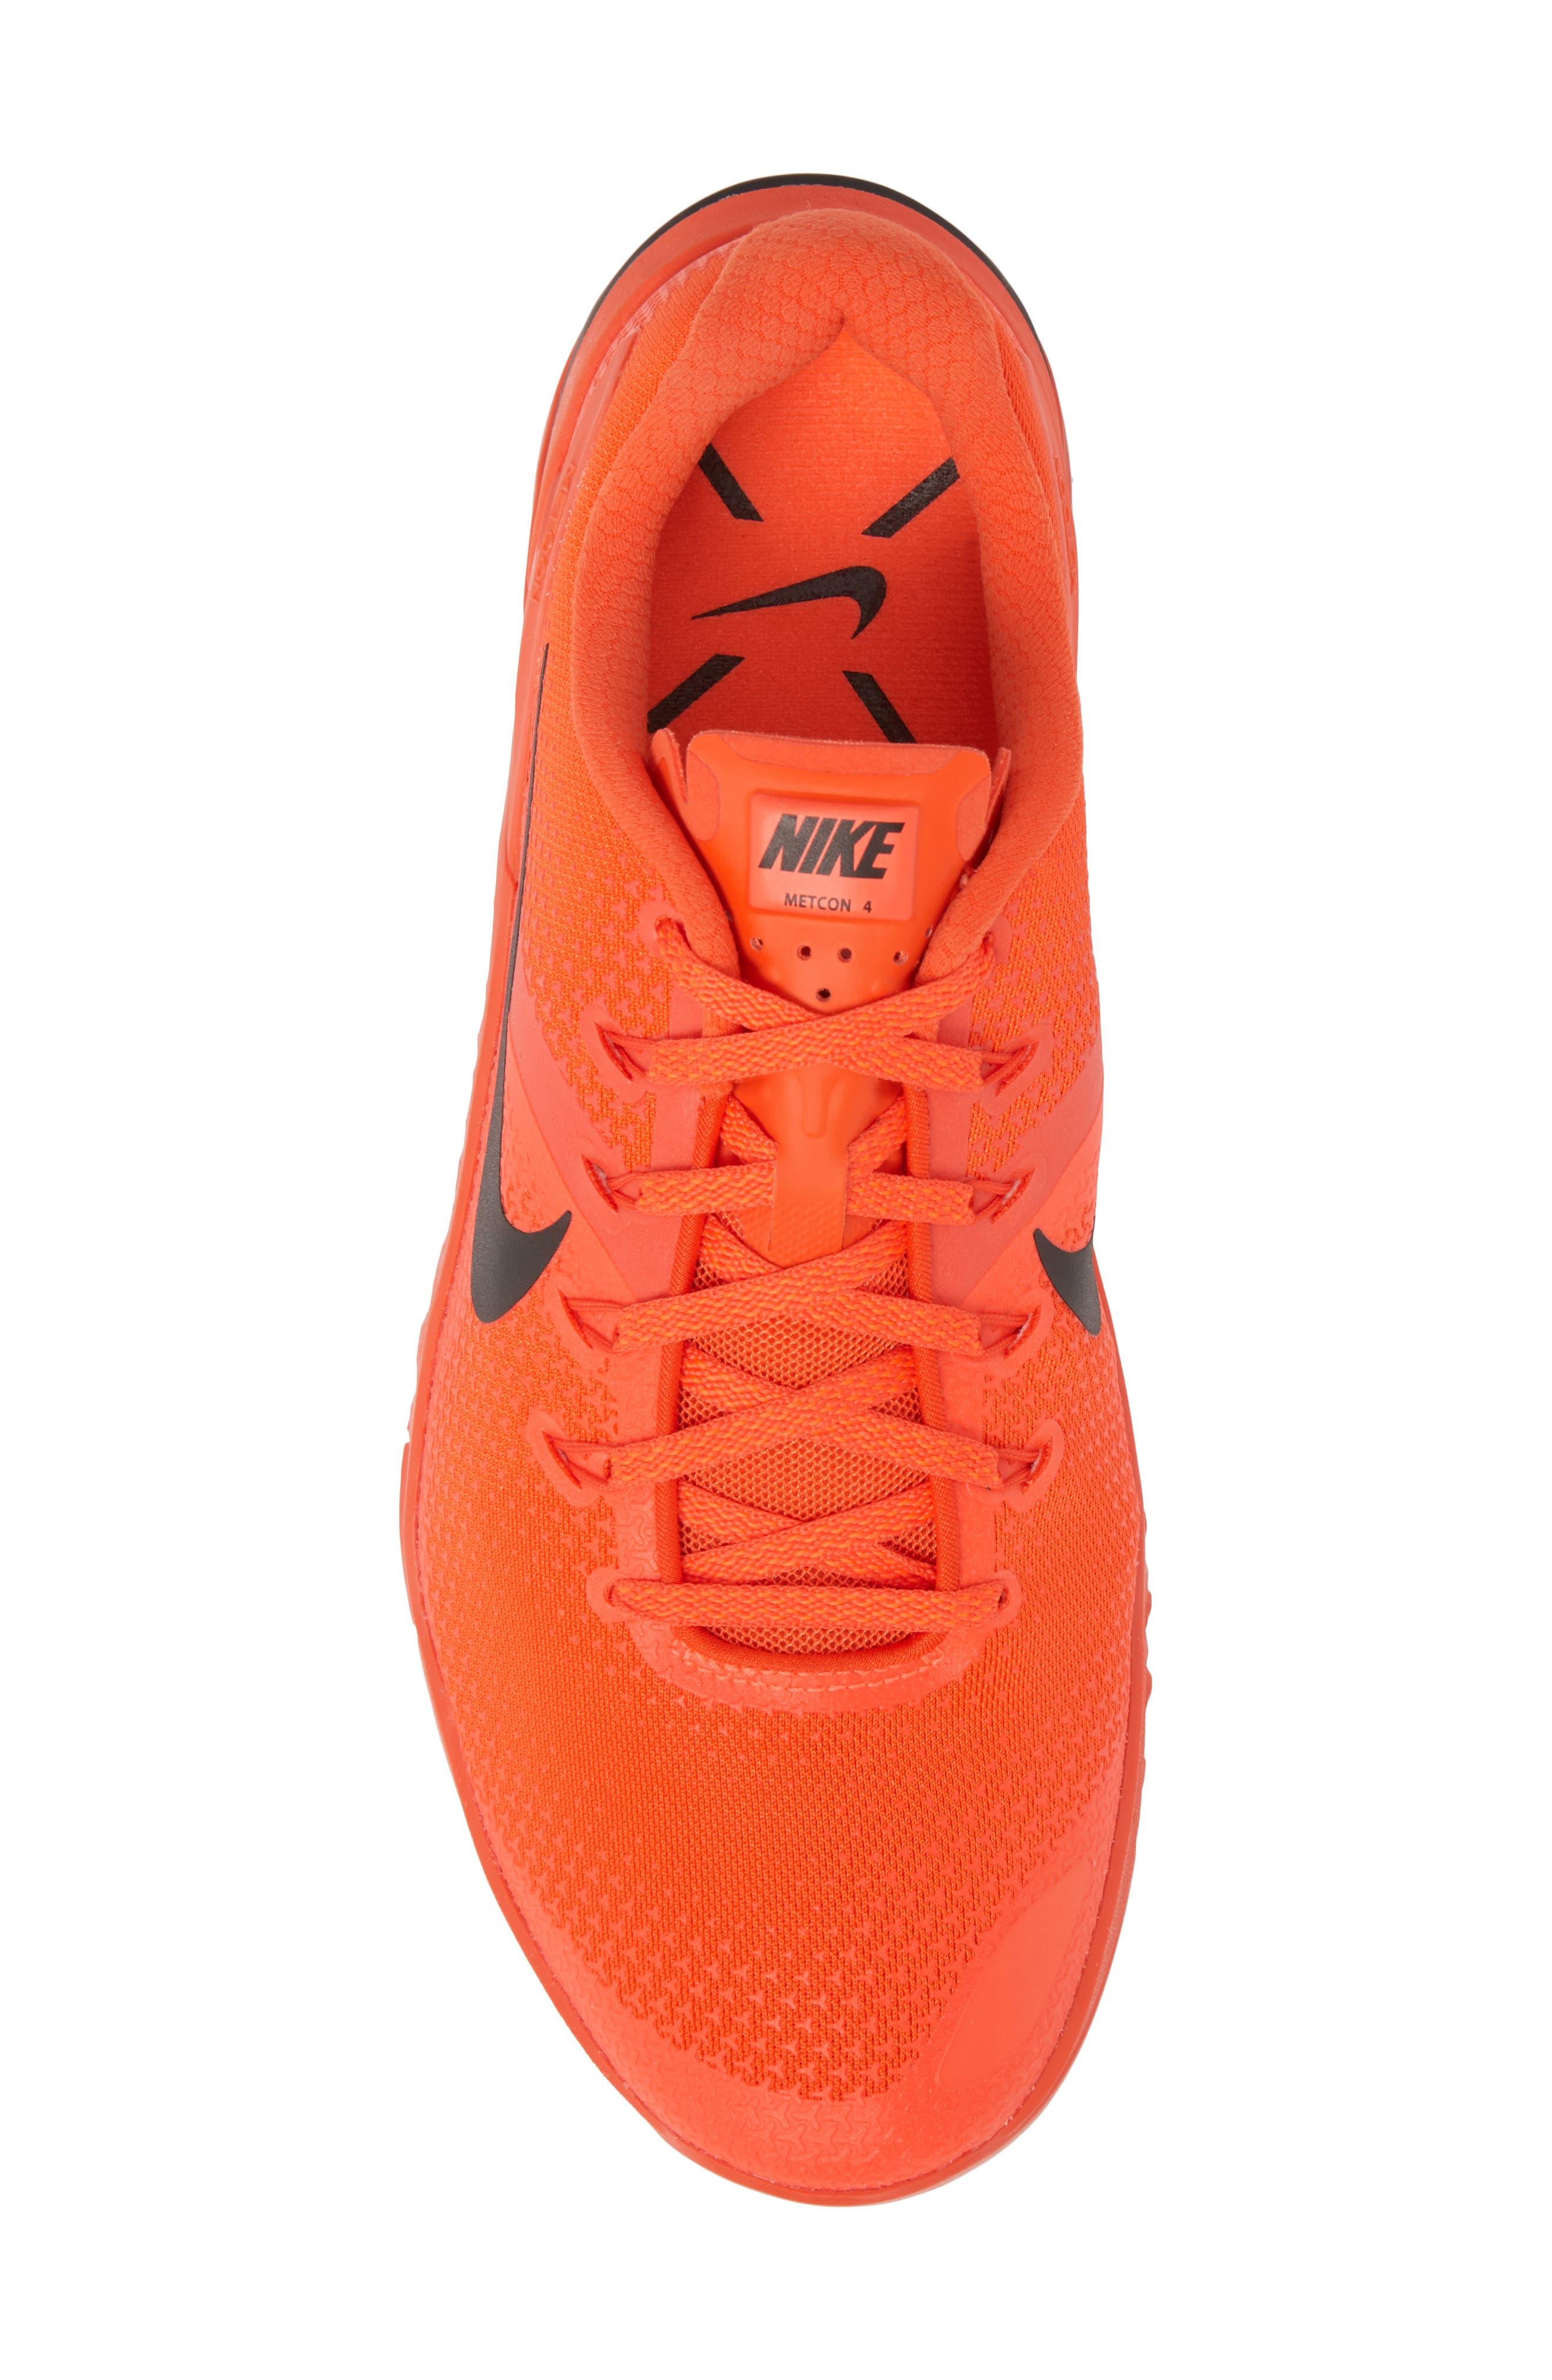 Metcon 4 Training Shoe,                             Alternate thumbnail 78, color,